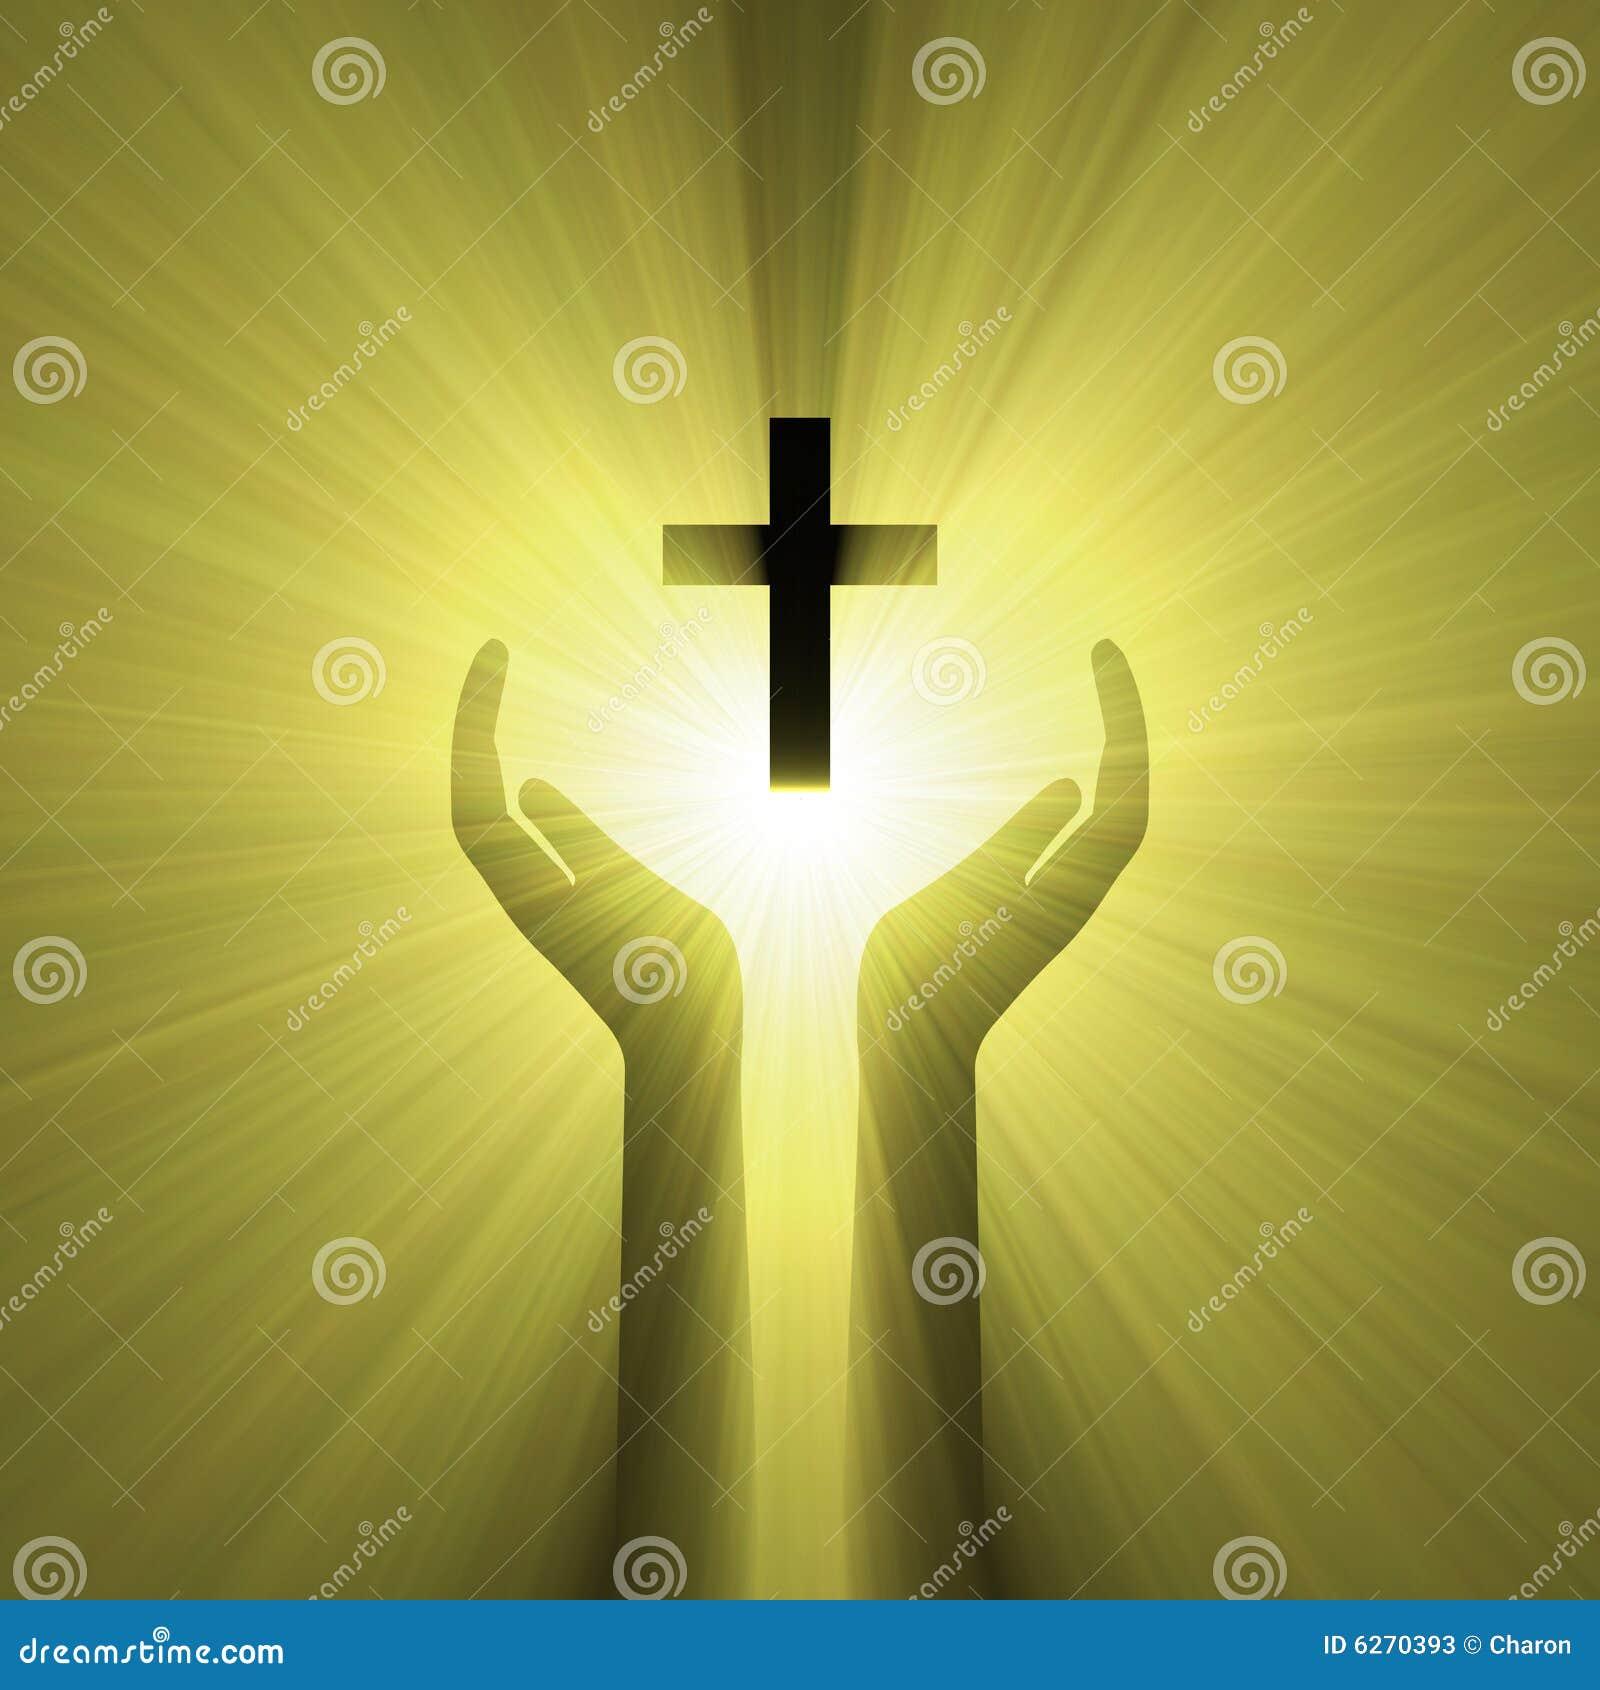 hand embrace god cross light halo stock photos image